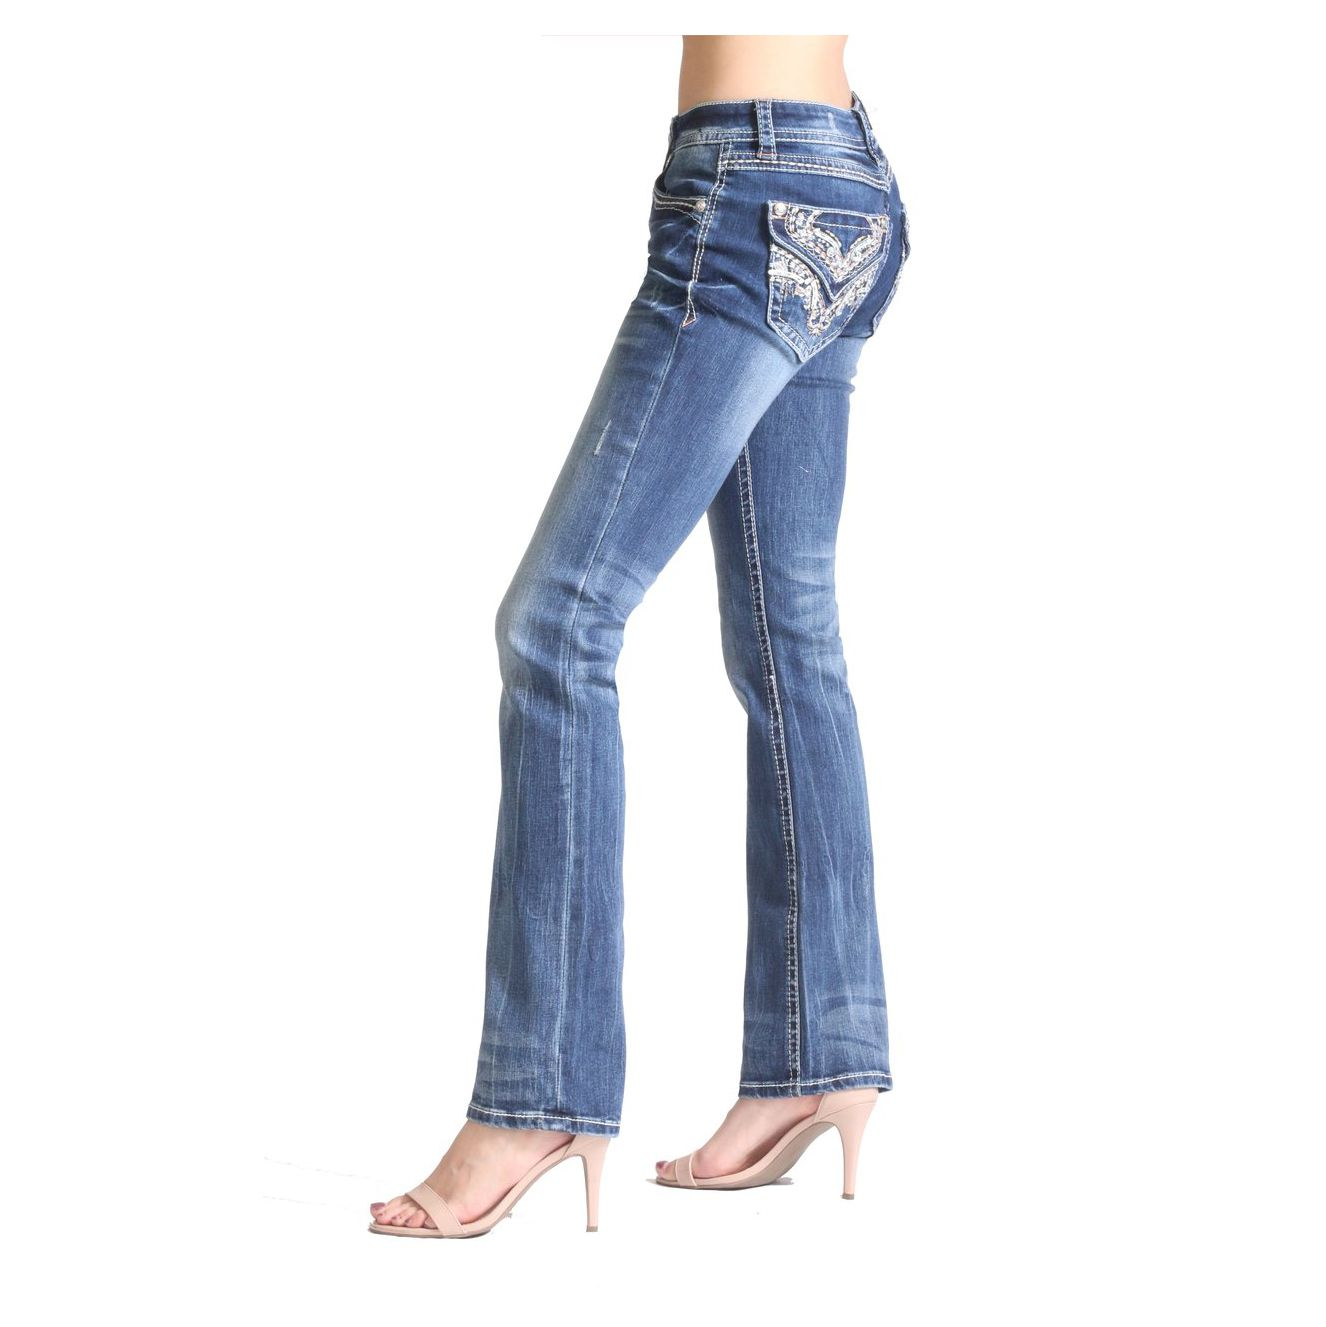 Calça Jeans Feminina Marie Bootcut Grace